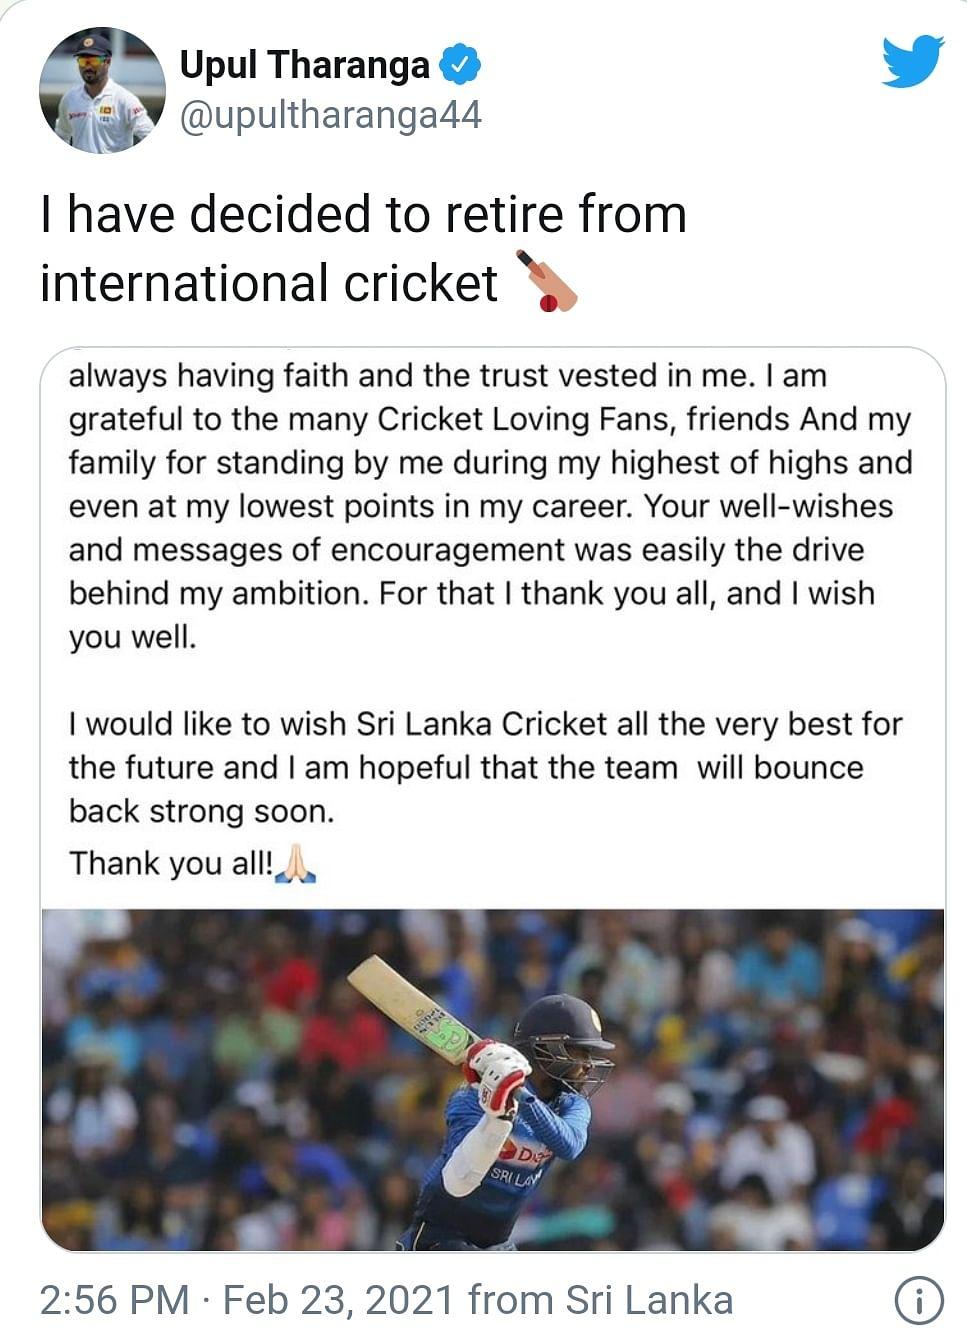 sri-lankan-batsman-upul-tharanga-retired-from-international-cricket